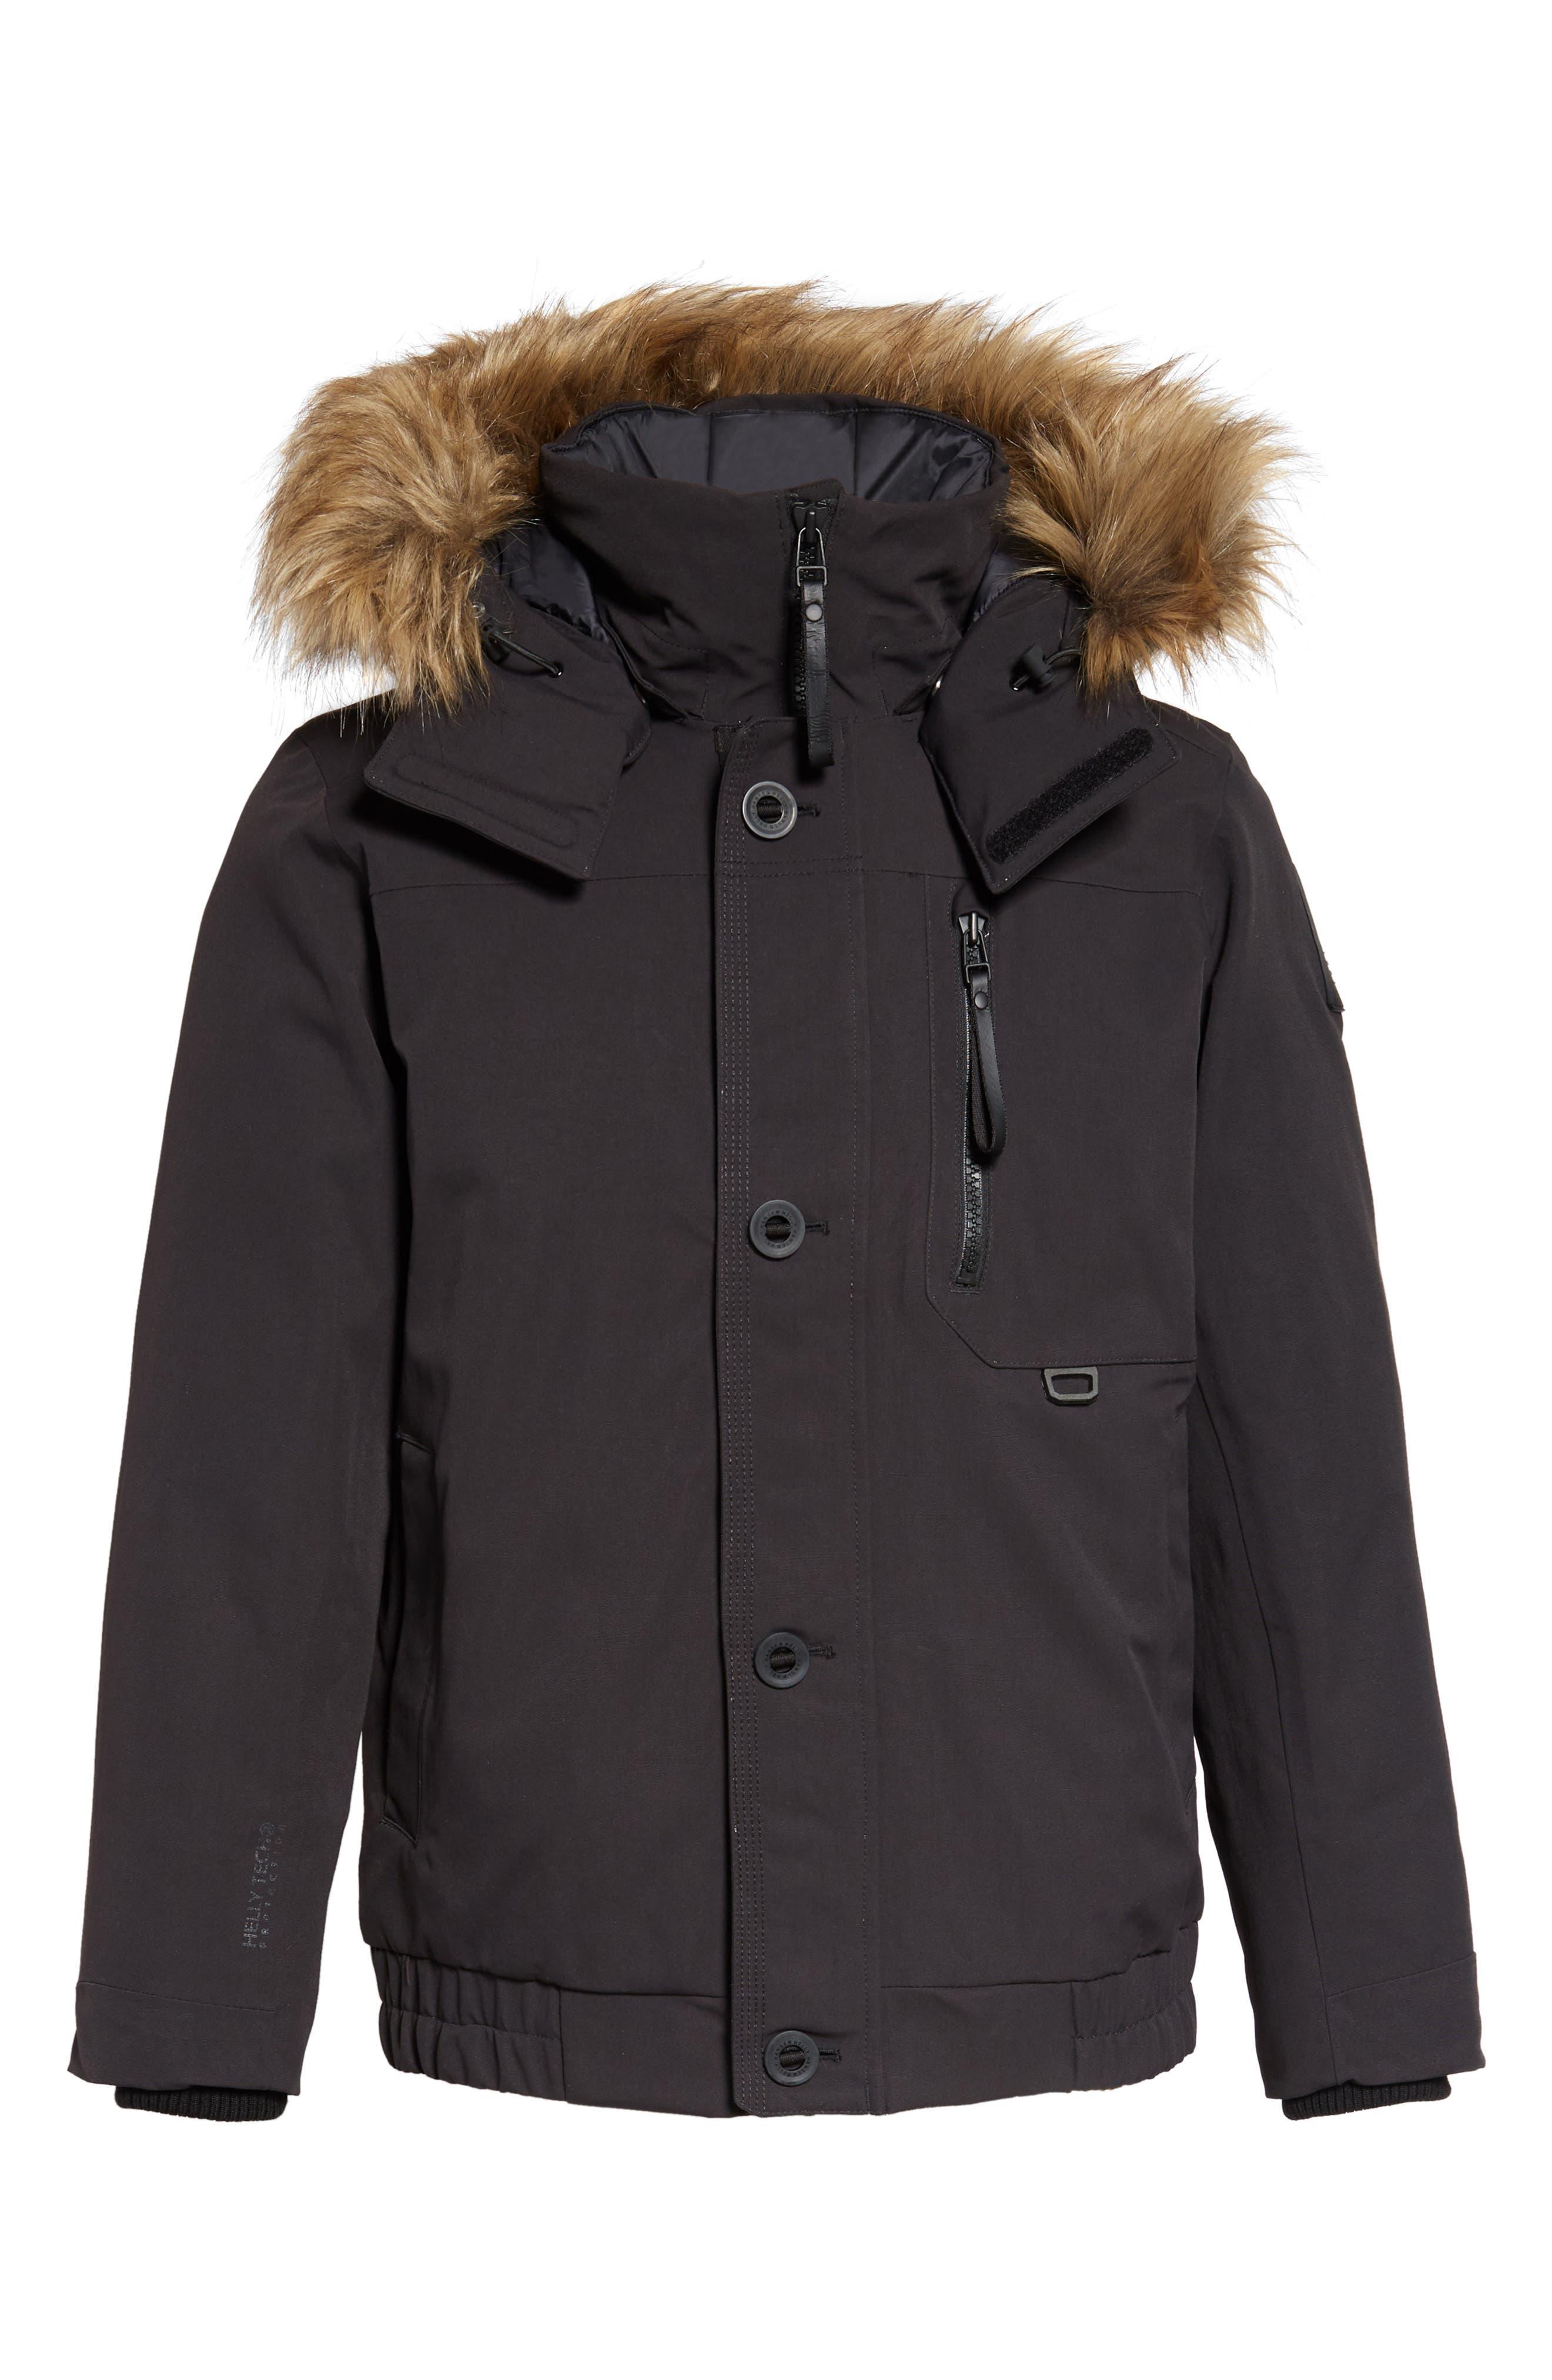 Bardu Waterproof Bomber Jacket with Detachable Hood and Faux Fur Trim,                             Alternate thumbnail 6, color,                             BLACK